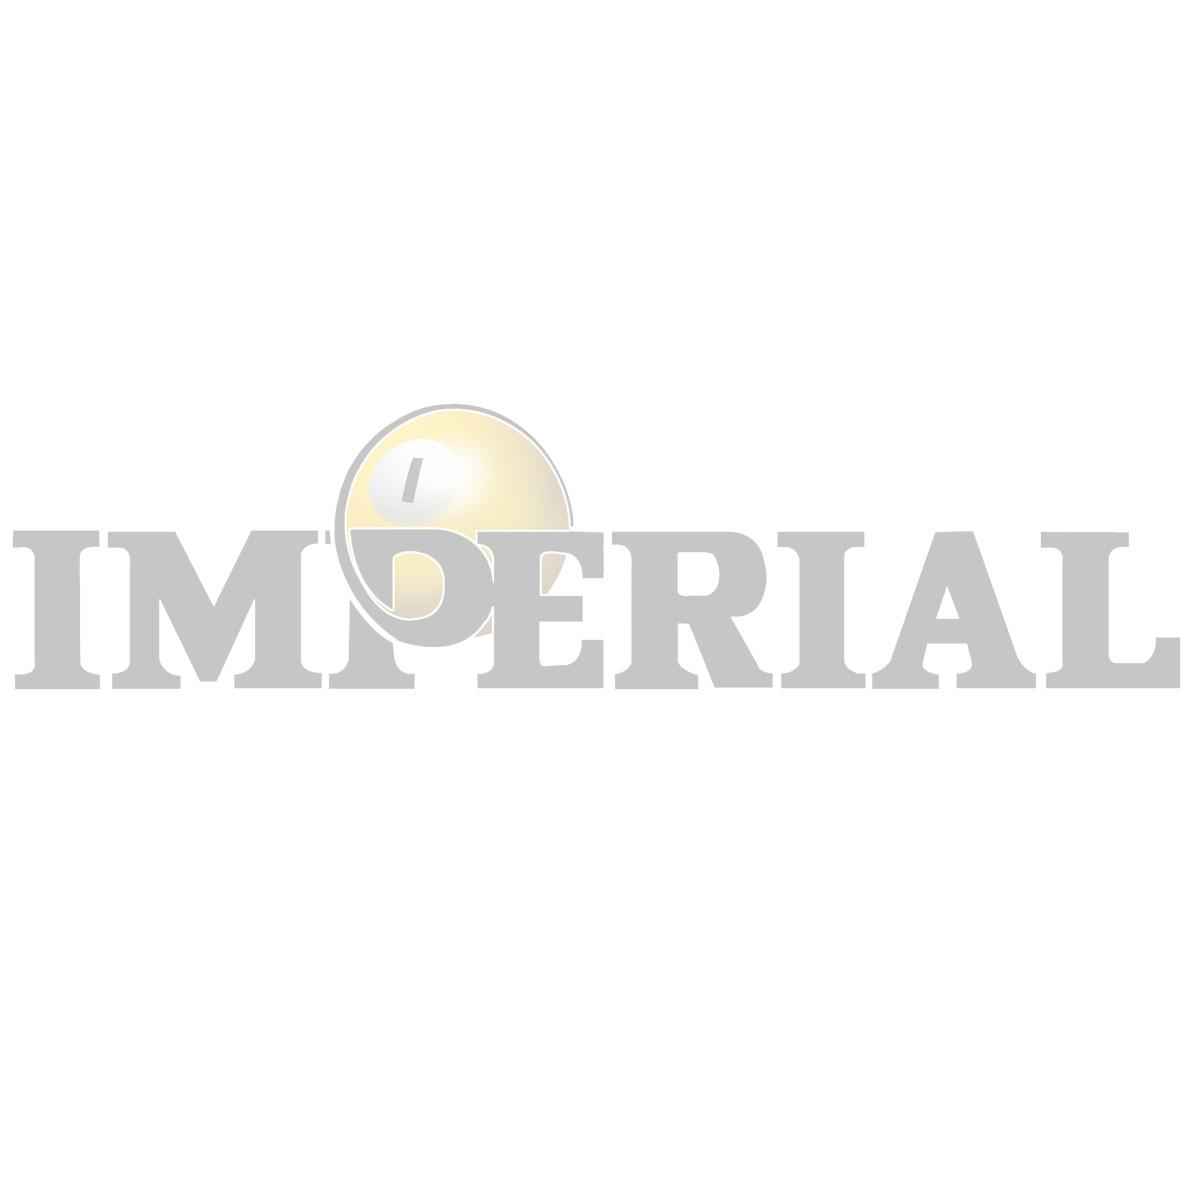 Cincinnati Reds Home vs. Away Billiard Ball Set